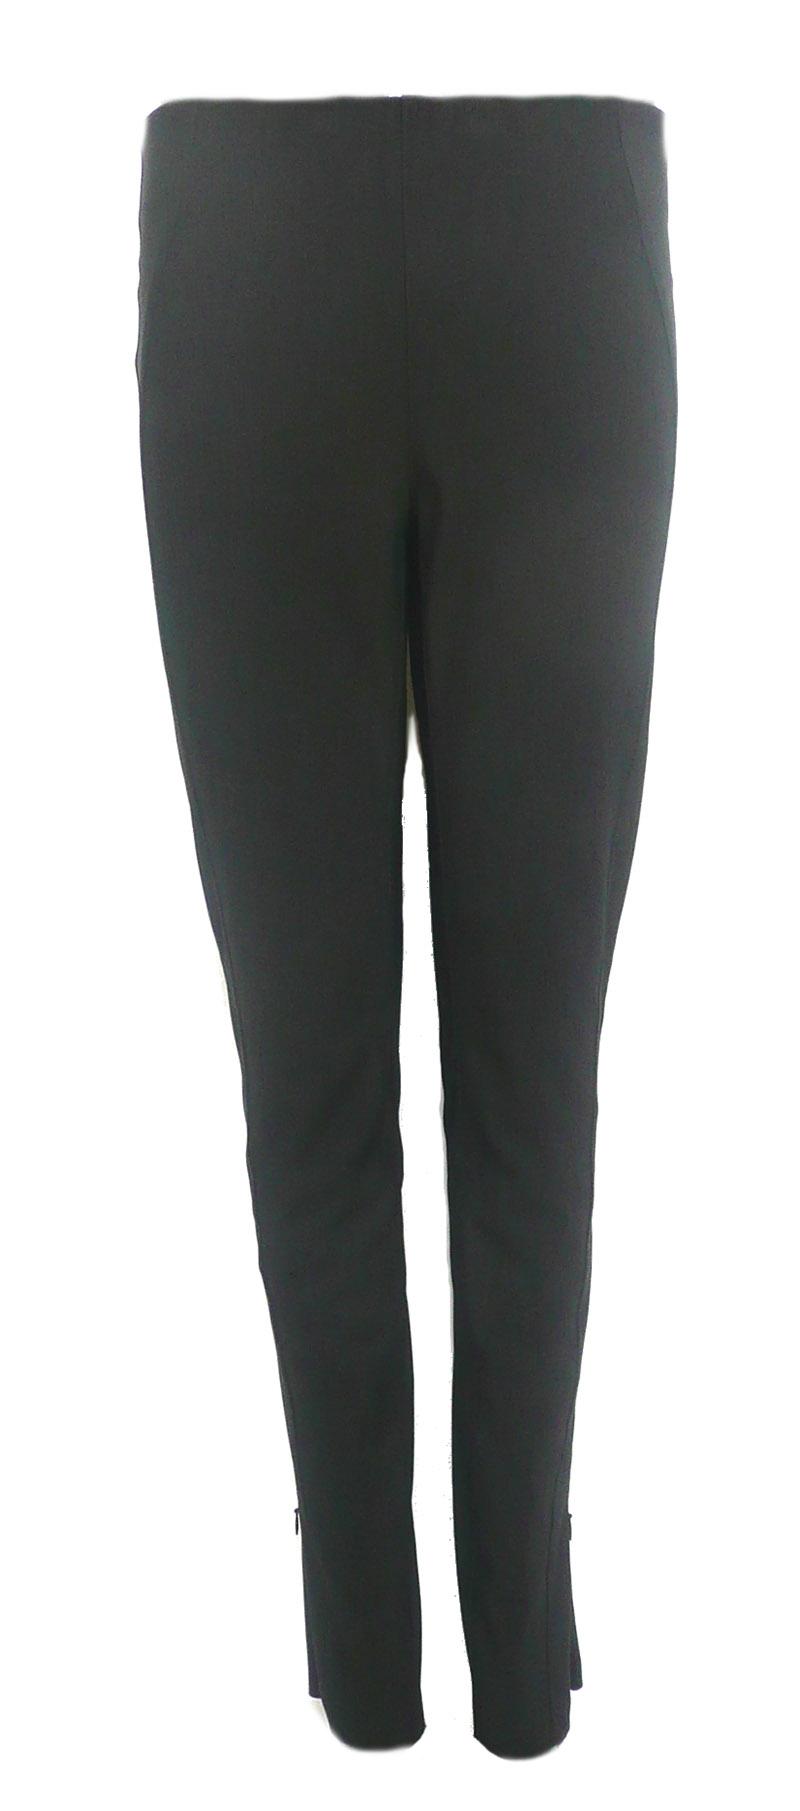 black suit pant.jpg